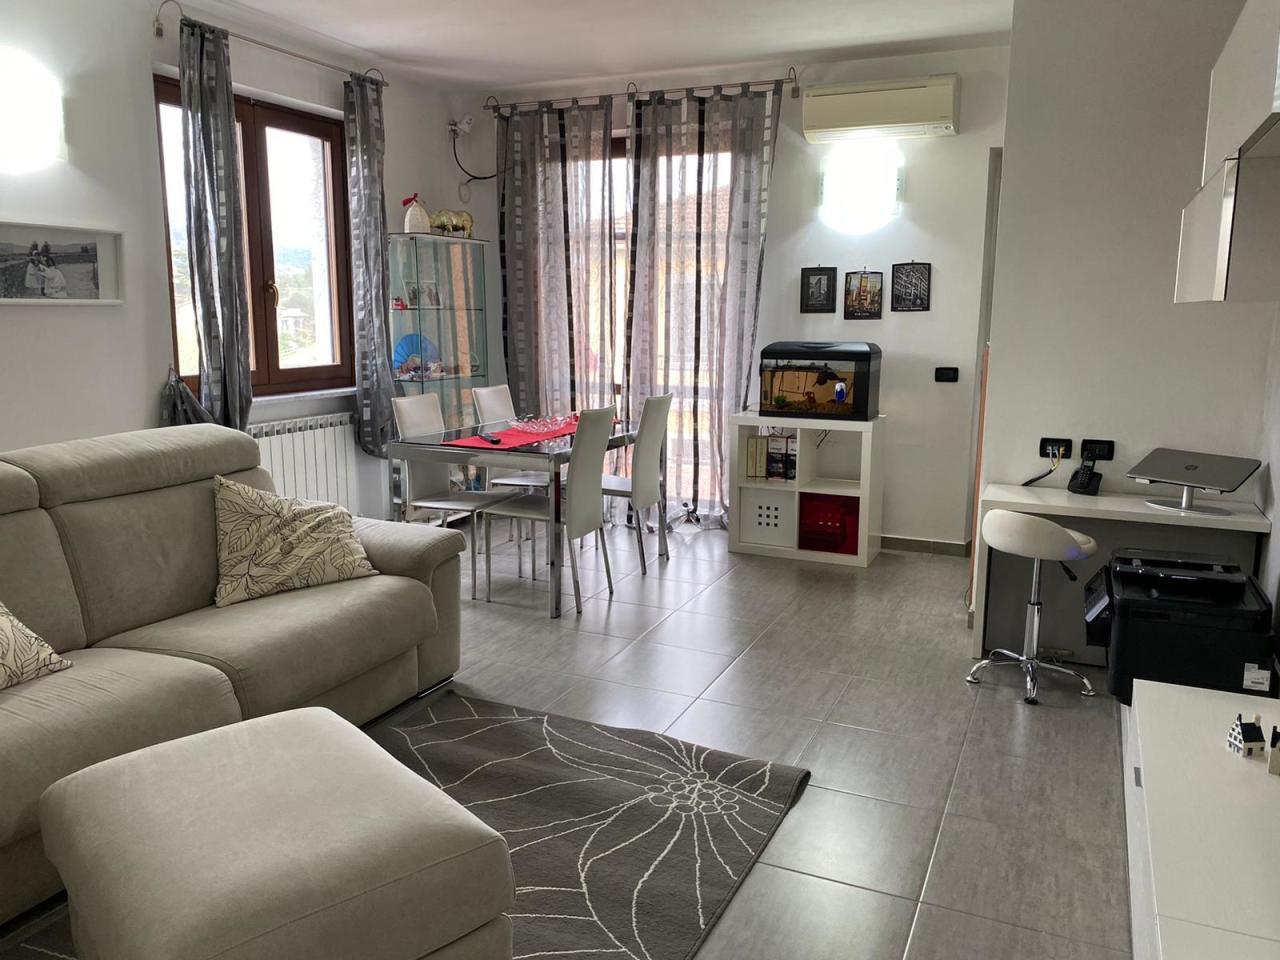 Casa semindipendente in vendita a Santo Stefano di Magra (SP)